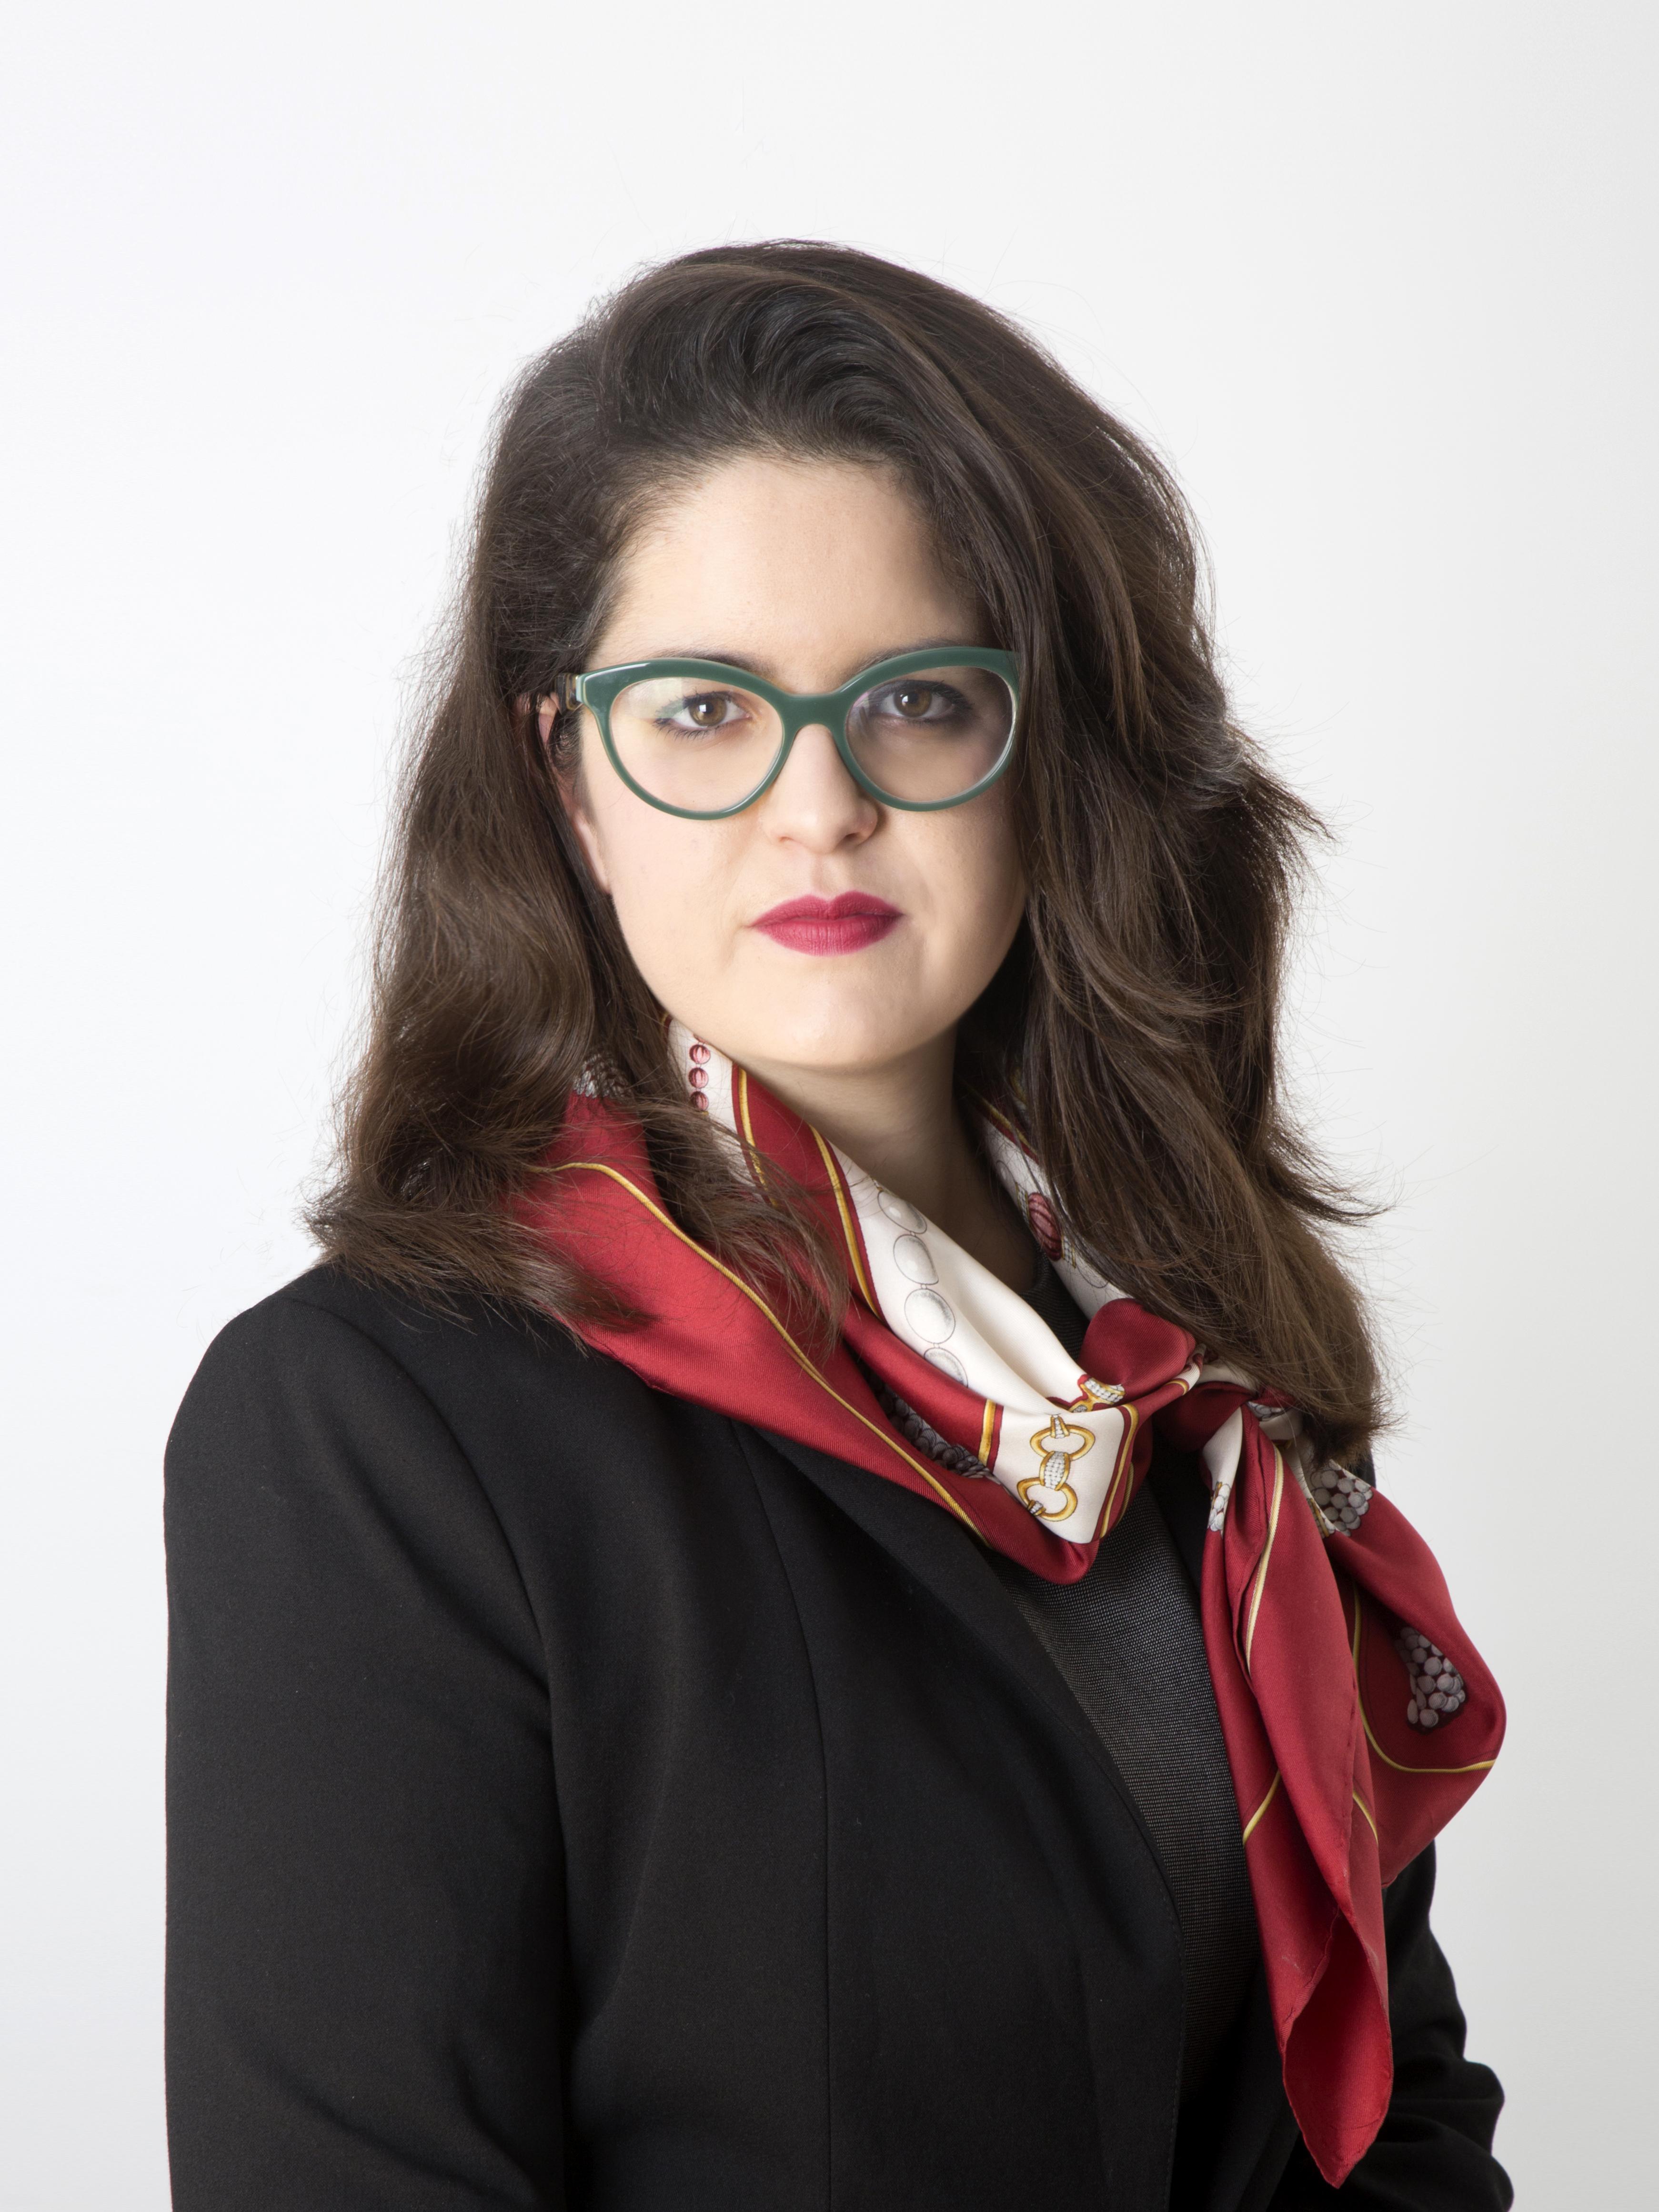 Ioanna Loudarou